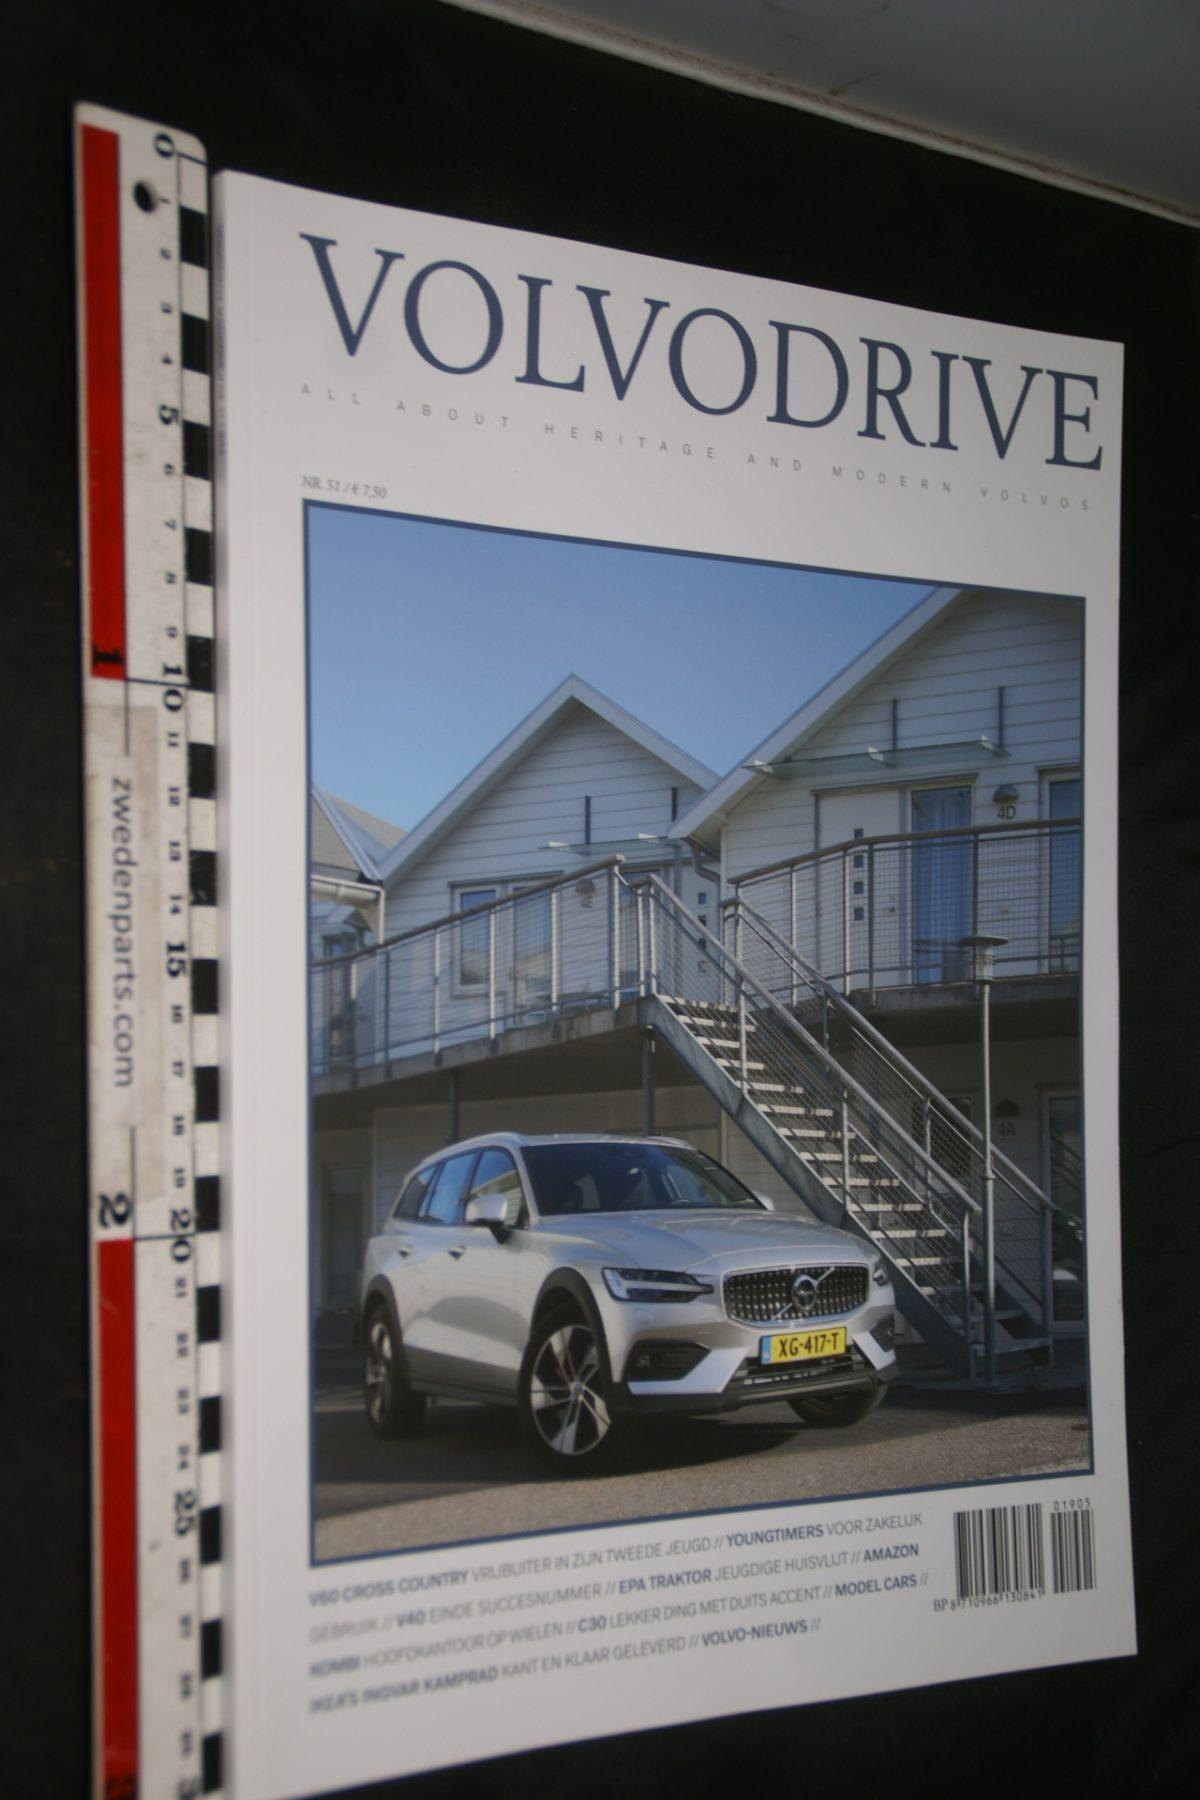 DSC05089 2019 tijdschrift Volvodrive nr 51